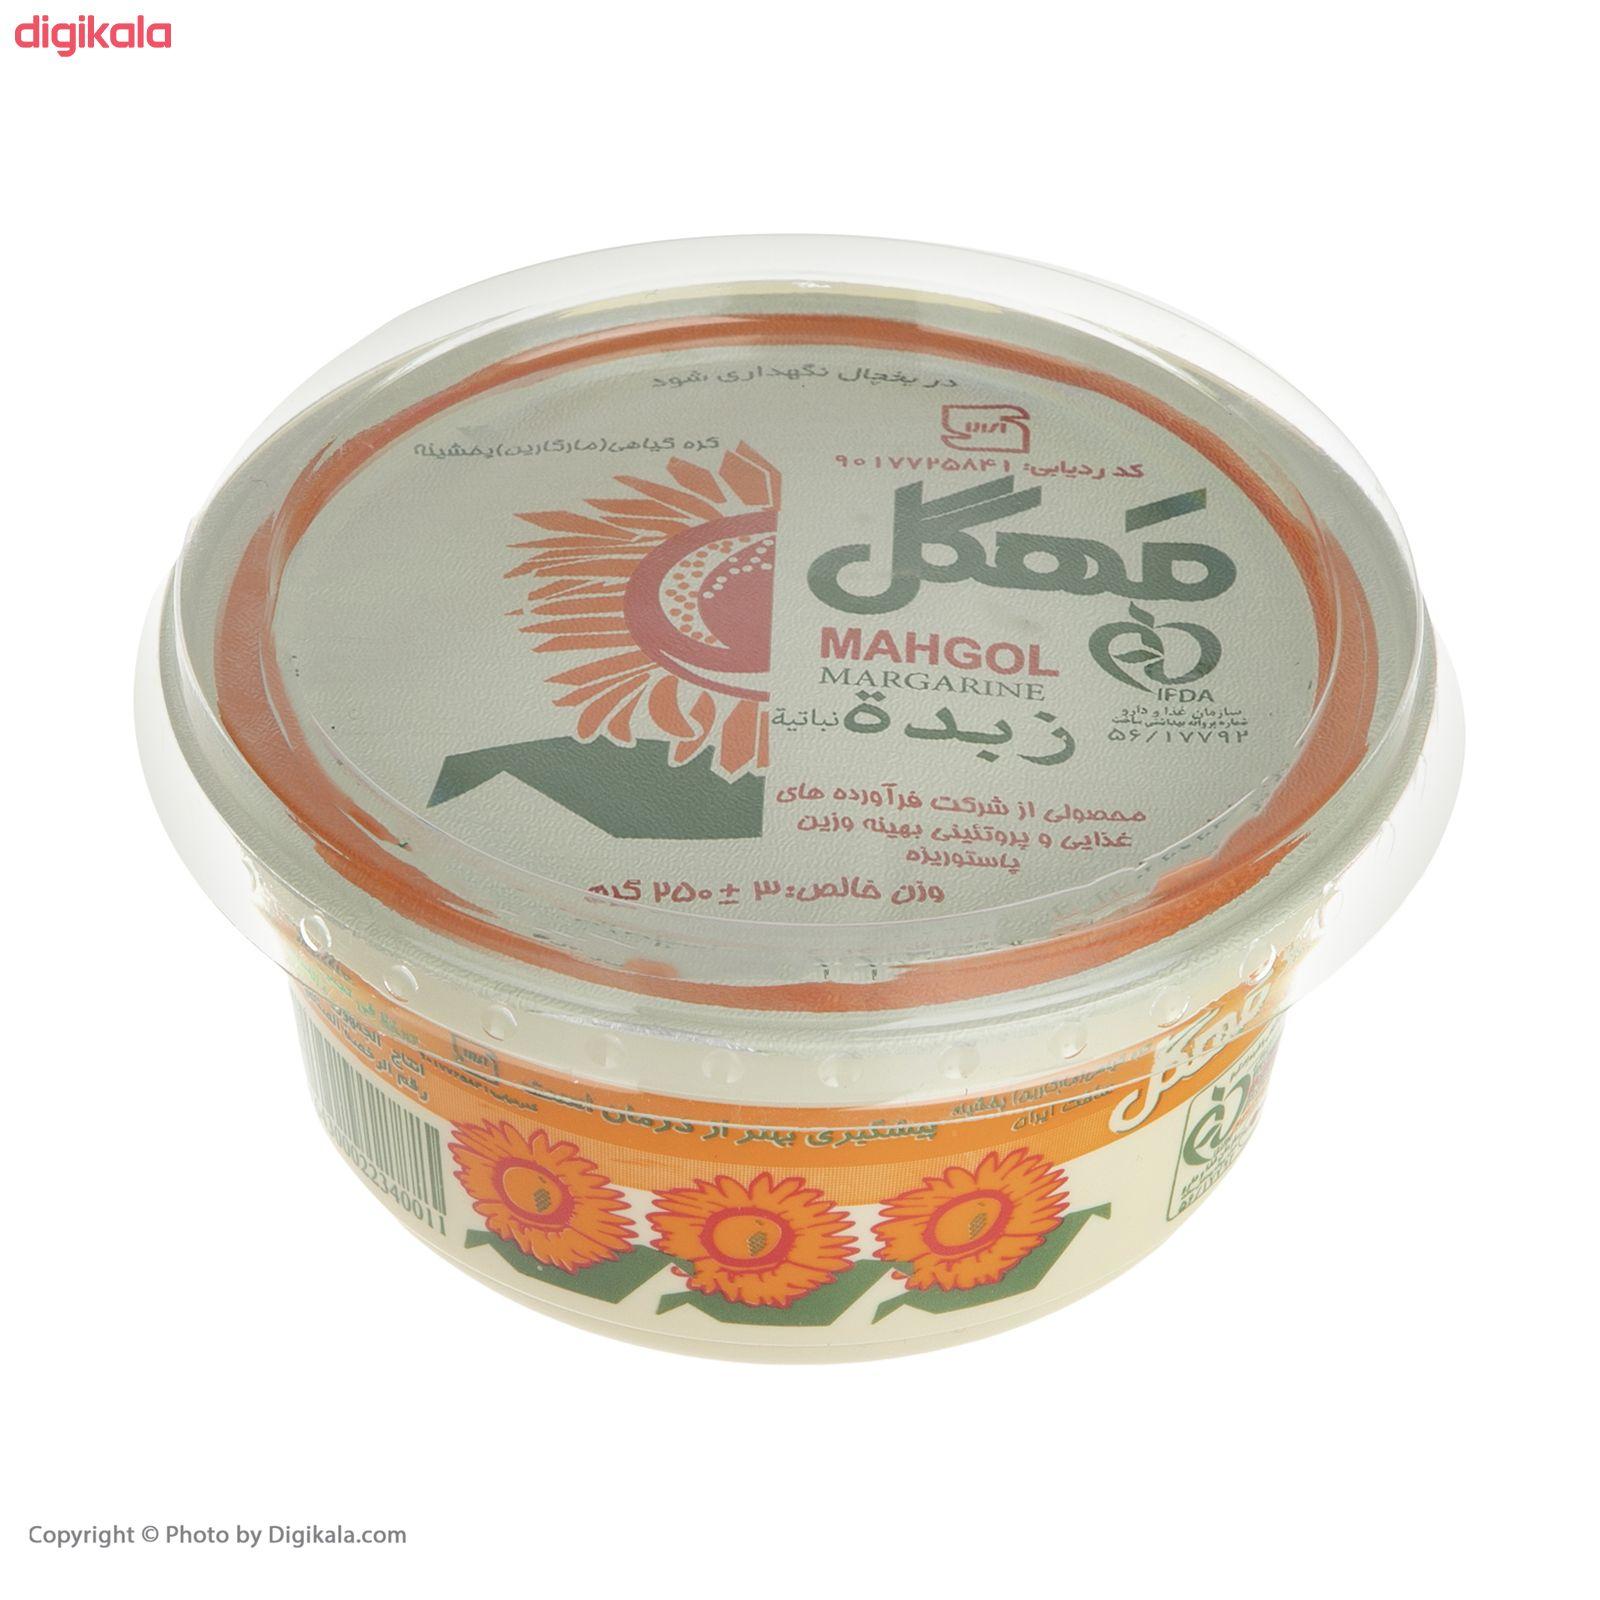 کره گیاهی مهگل - 250 گرم  main 1 2